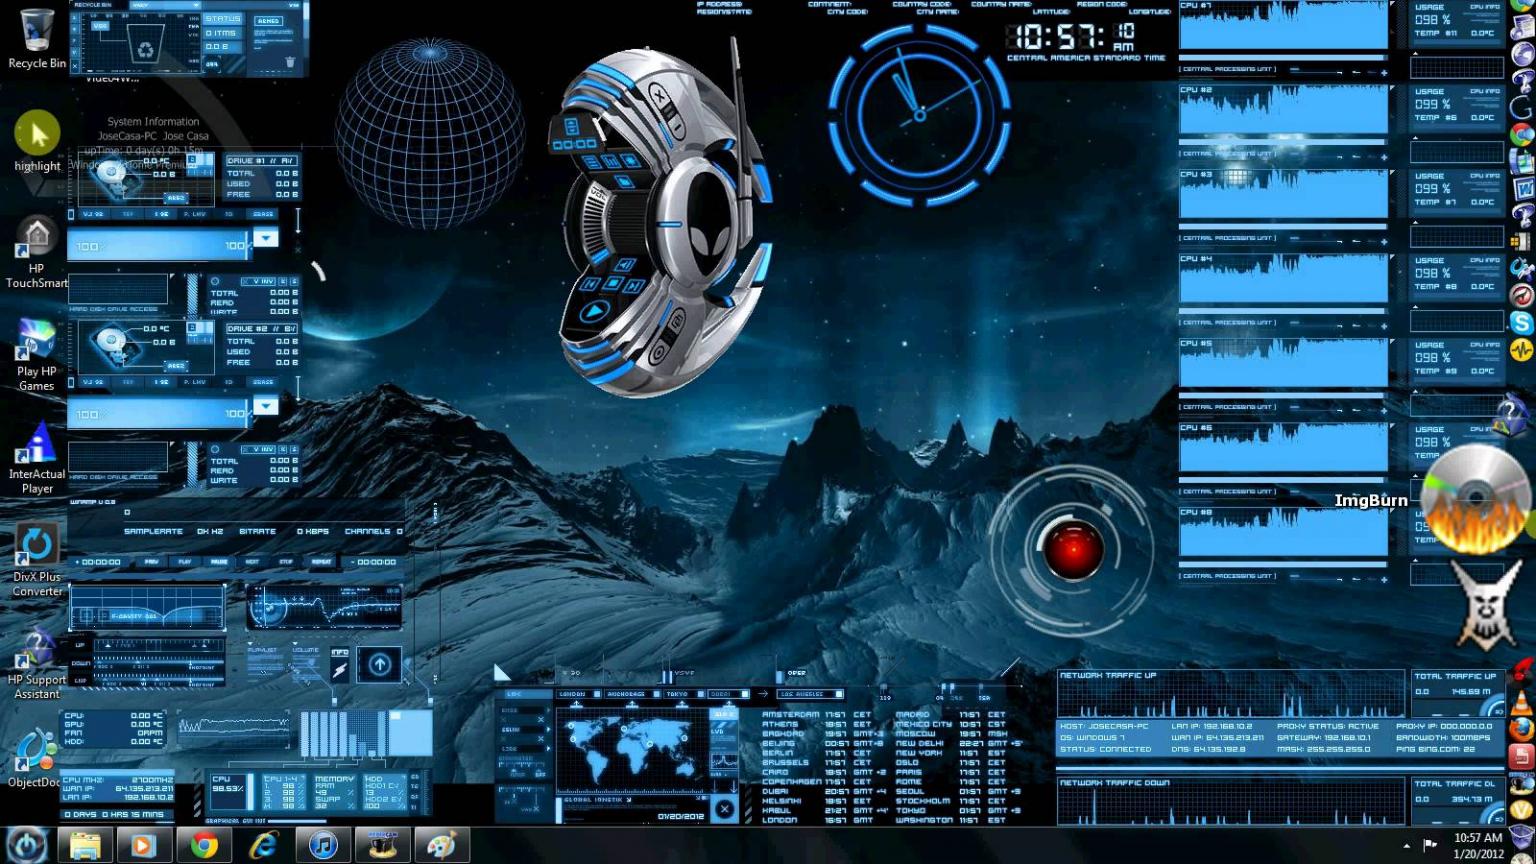 Free Windows 7 3D Desktop Puter Theme [